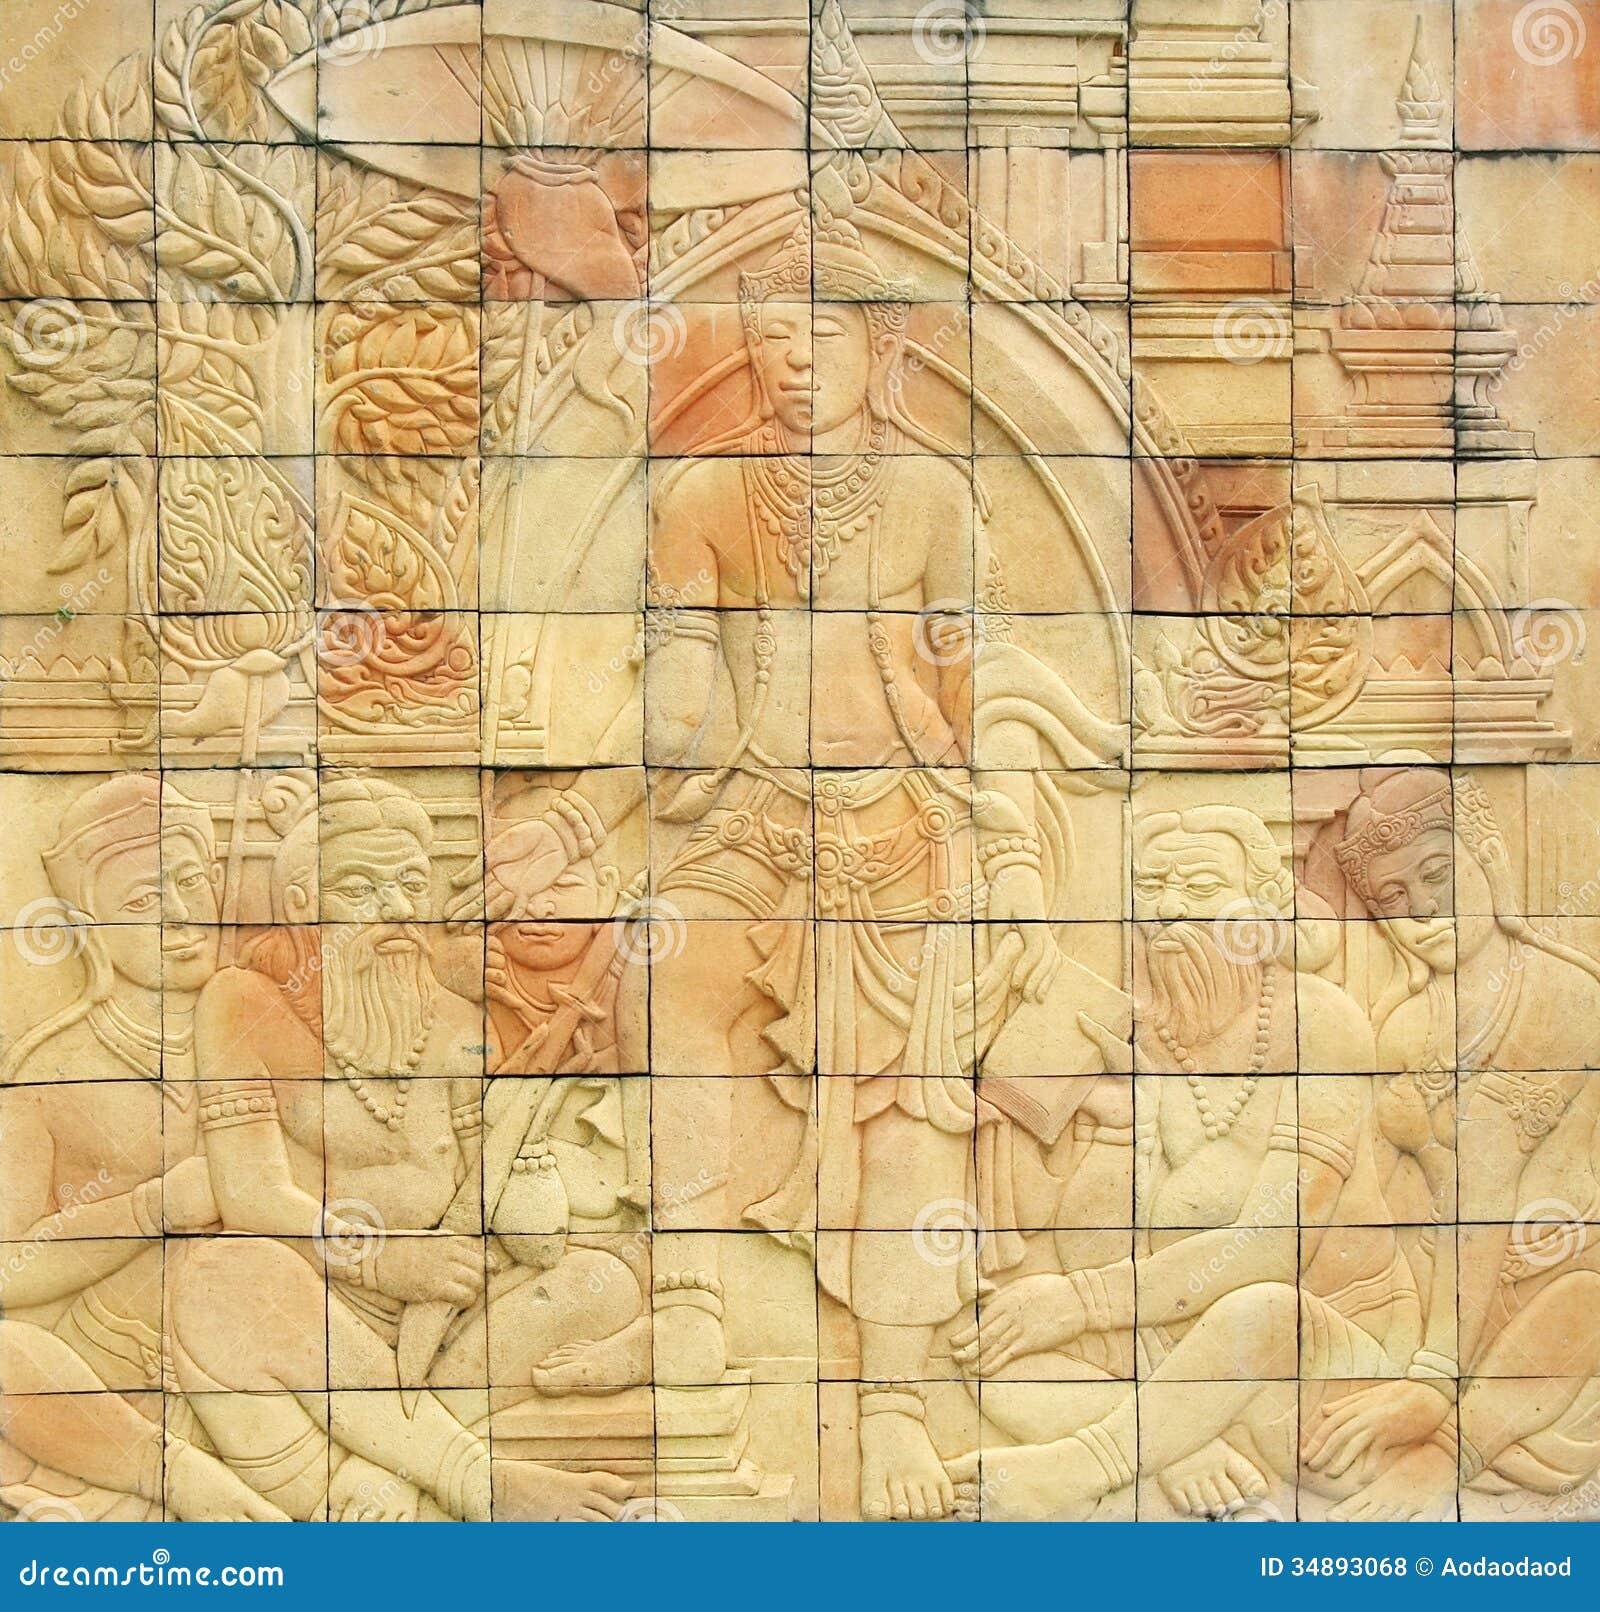 Stone Wall Art thailand art stone wall stock image - image: 34893051